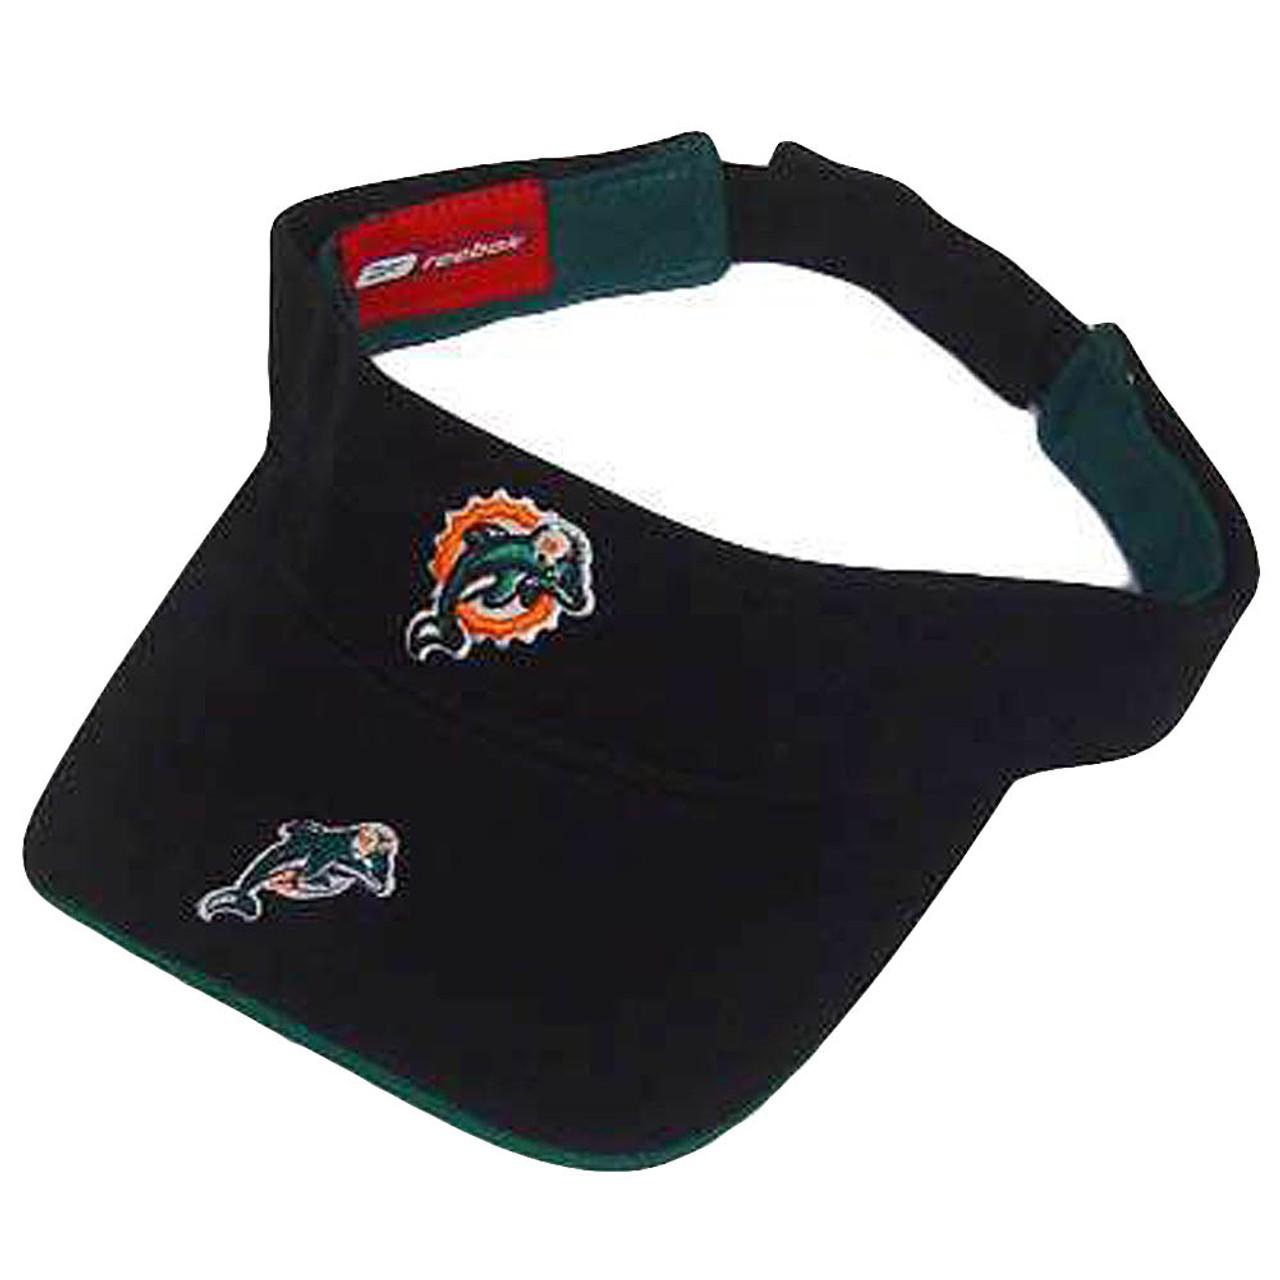 NFL MIAMI DOLPHINS REEBOK BLACK VISOR HAT CAP YOUTH KID - Sinbad ... 0153db51e